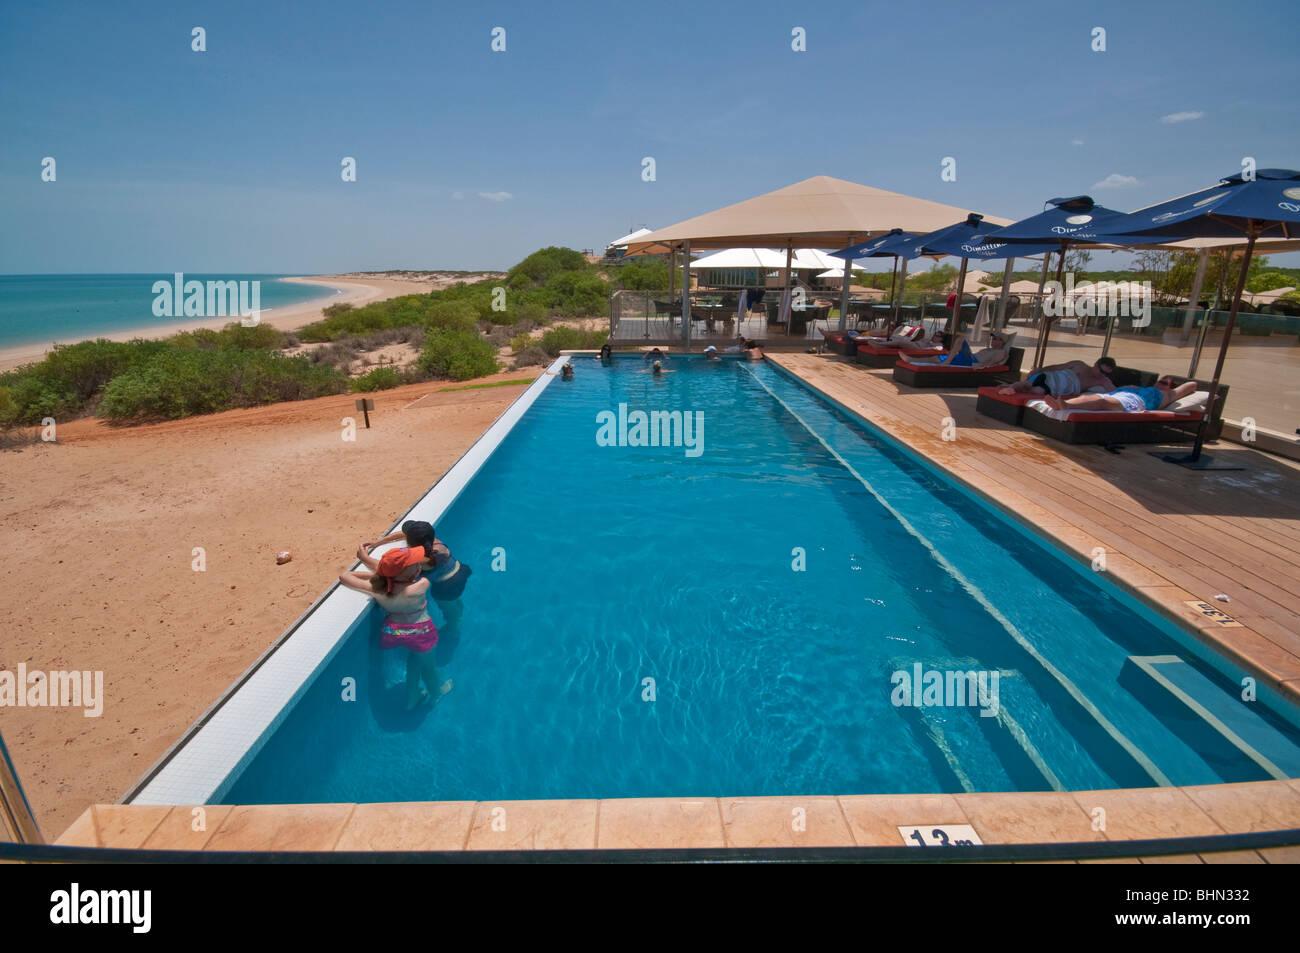 Swimming pool at Echo Beach Resort on the Kimberley region of Western Australia - Stock Image